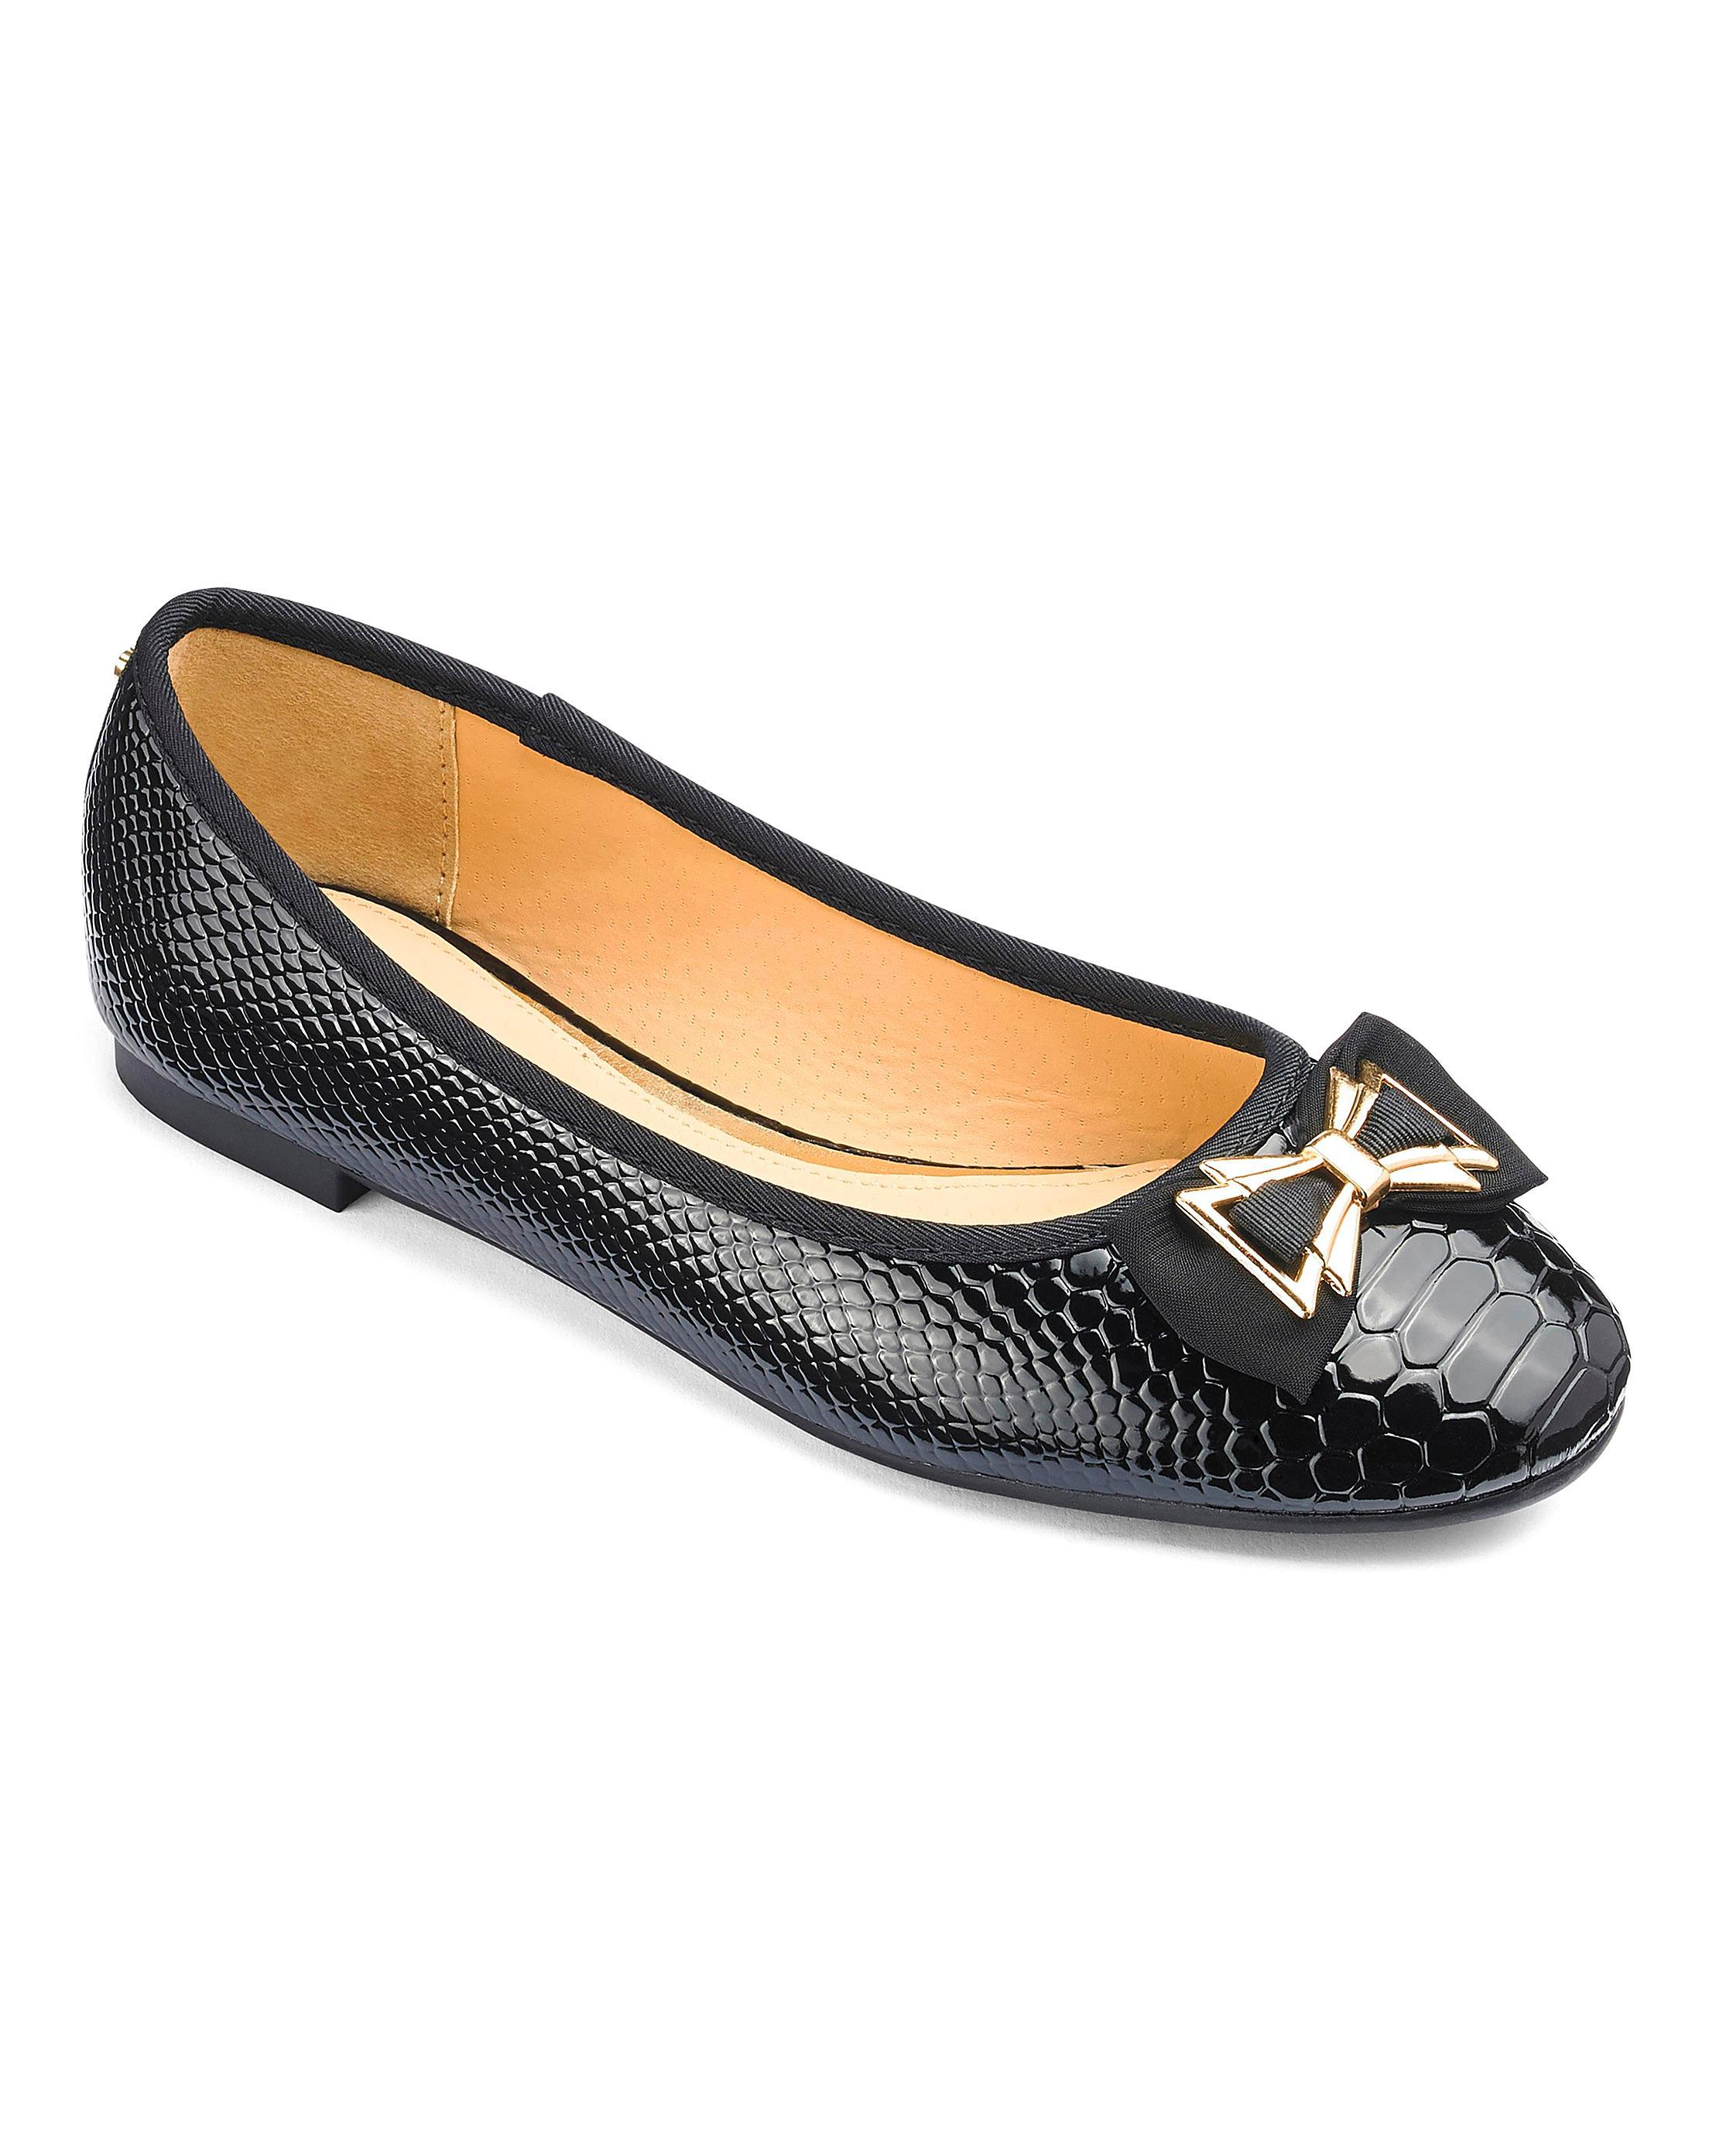 ff0a3a7c051c Lyst - Simply Be Head Over Heels By Dune Haze Ballerina Standard Fit